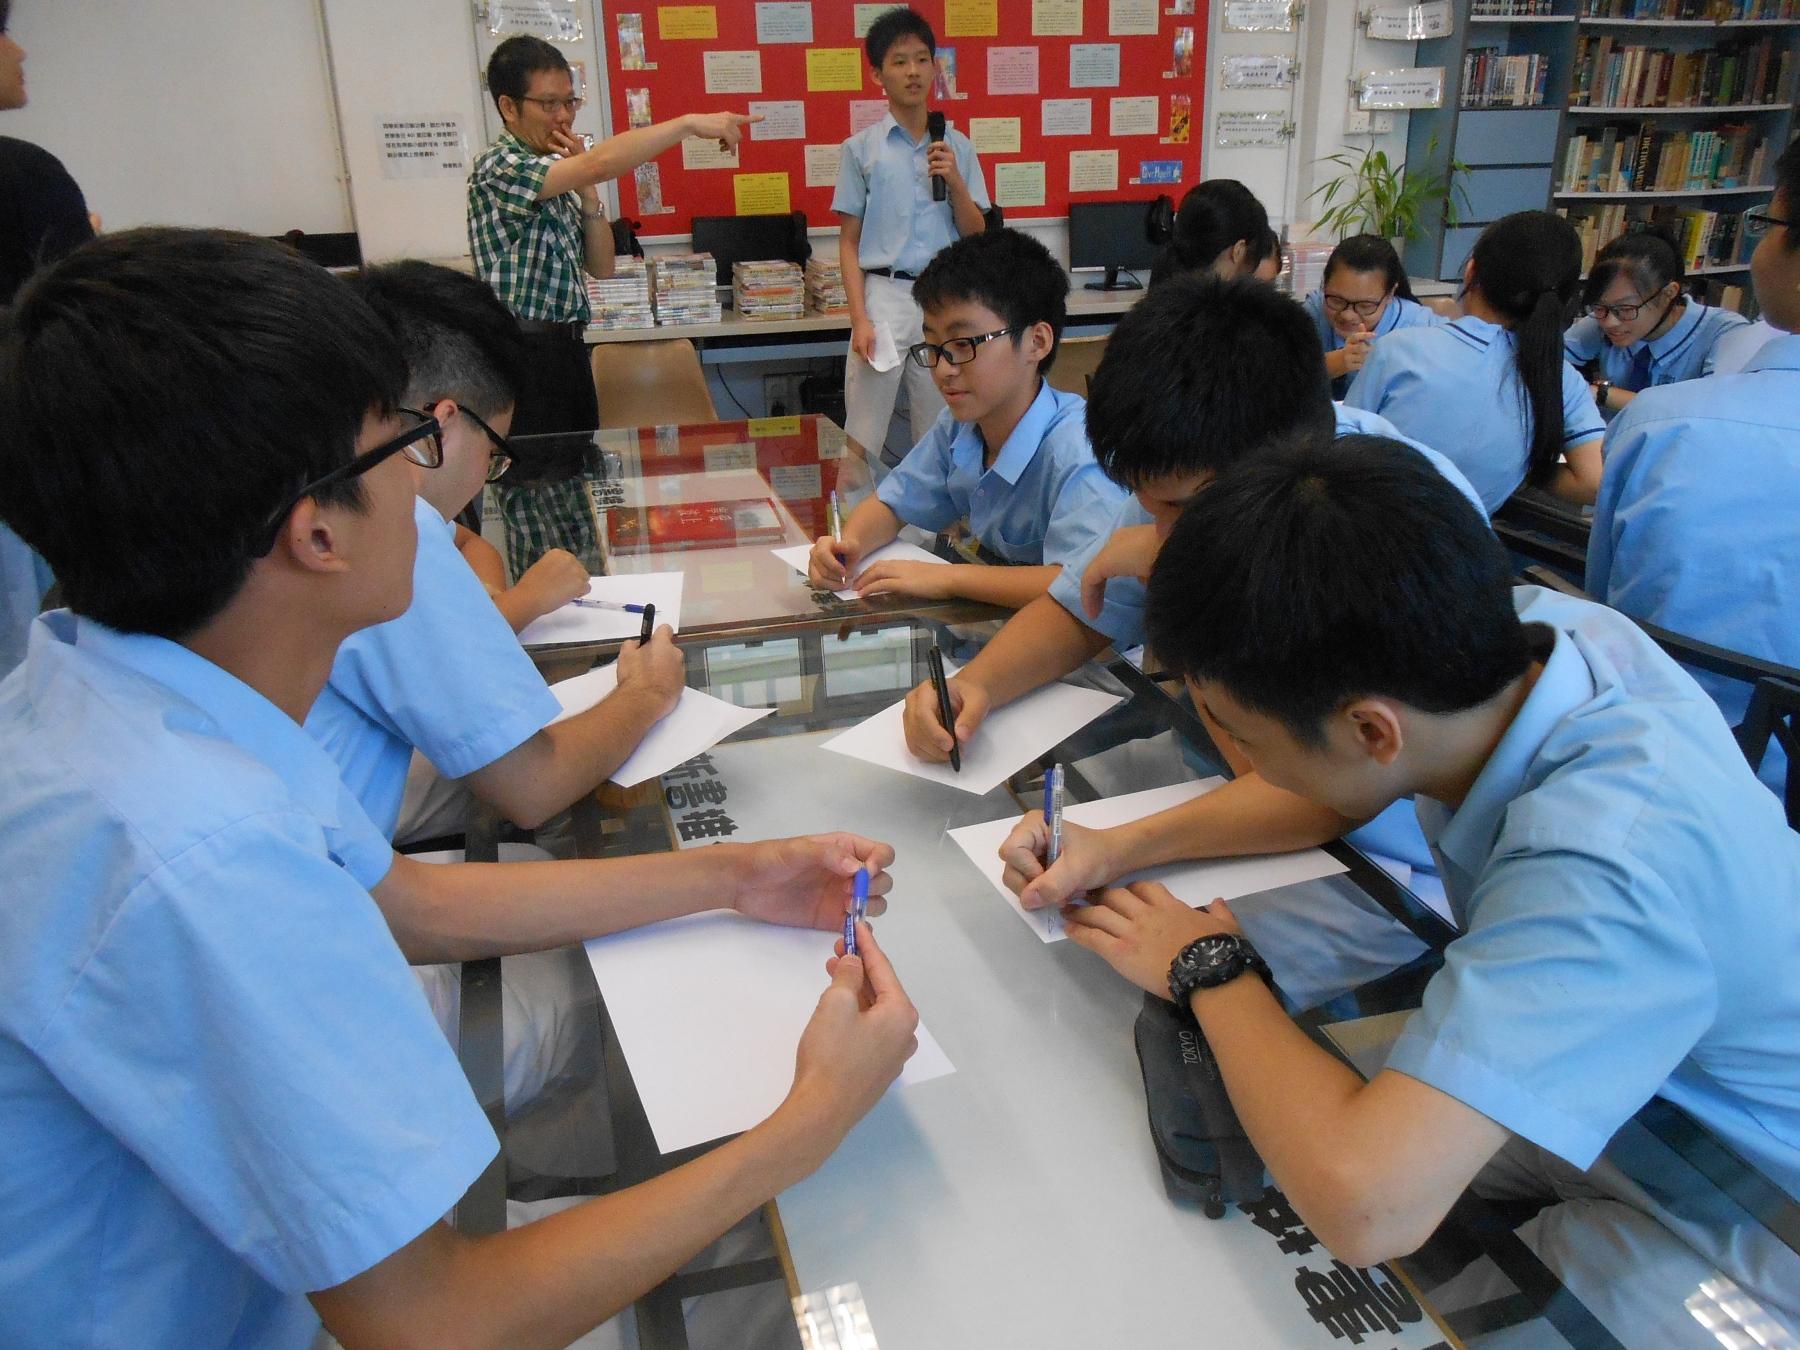 http://www.npc.edu.hk/sites/default/files/dscn1317.jpg